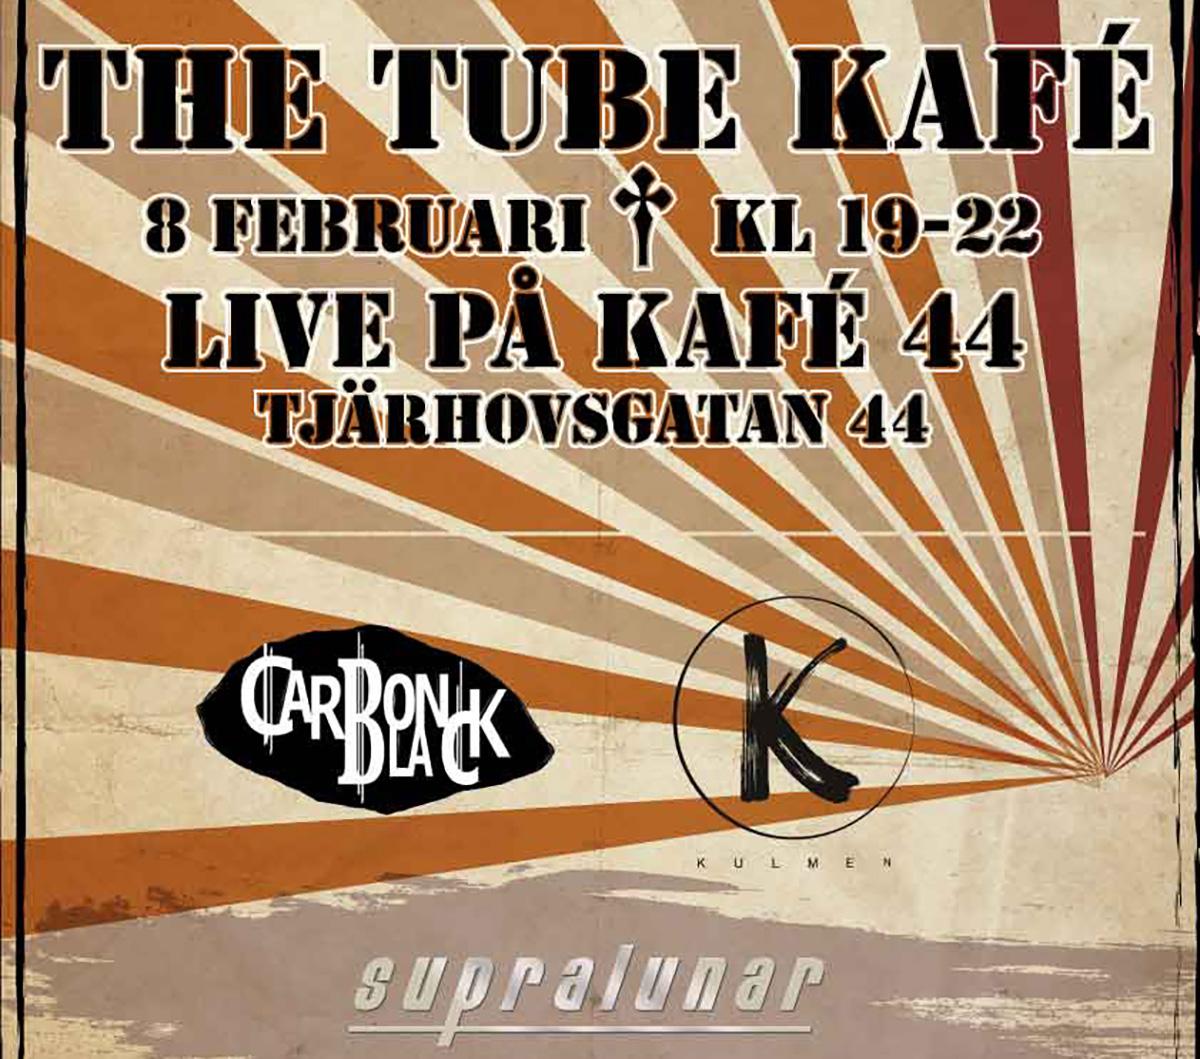 The Tube Kafe